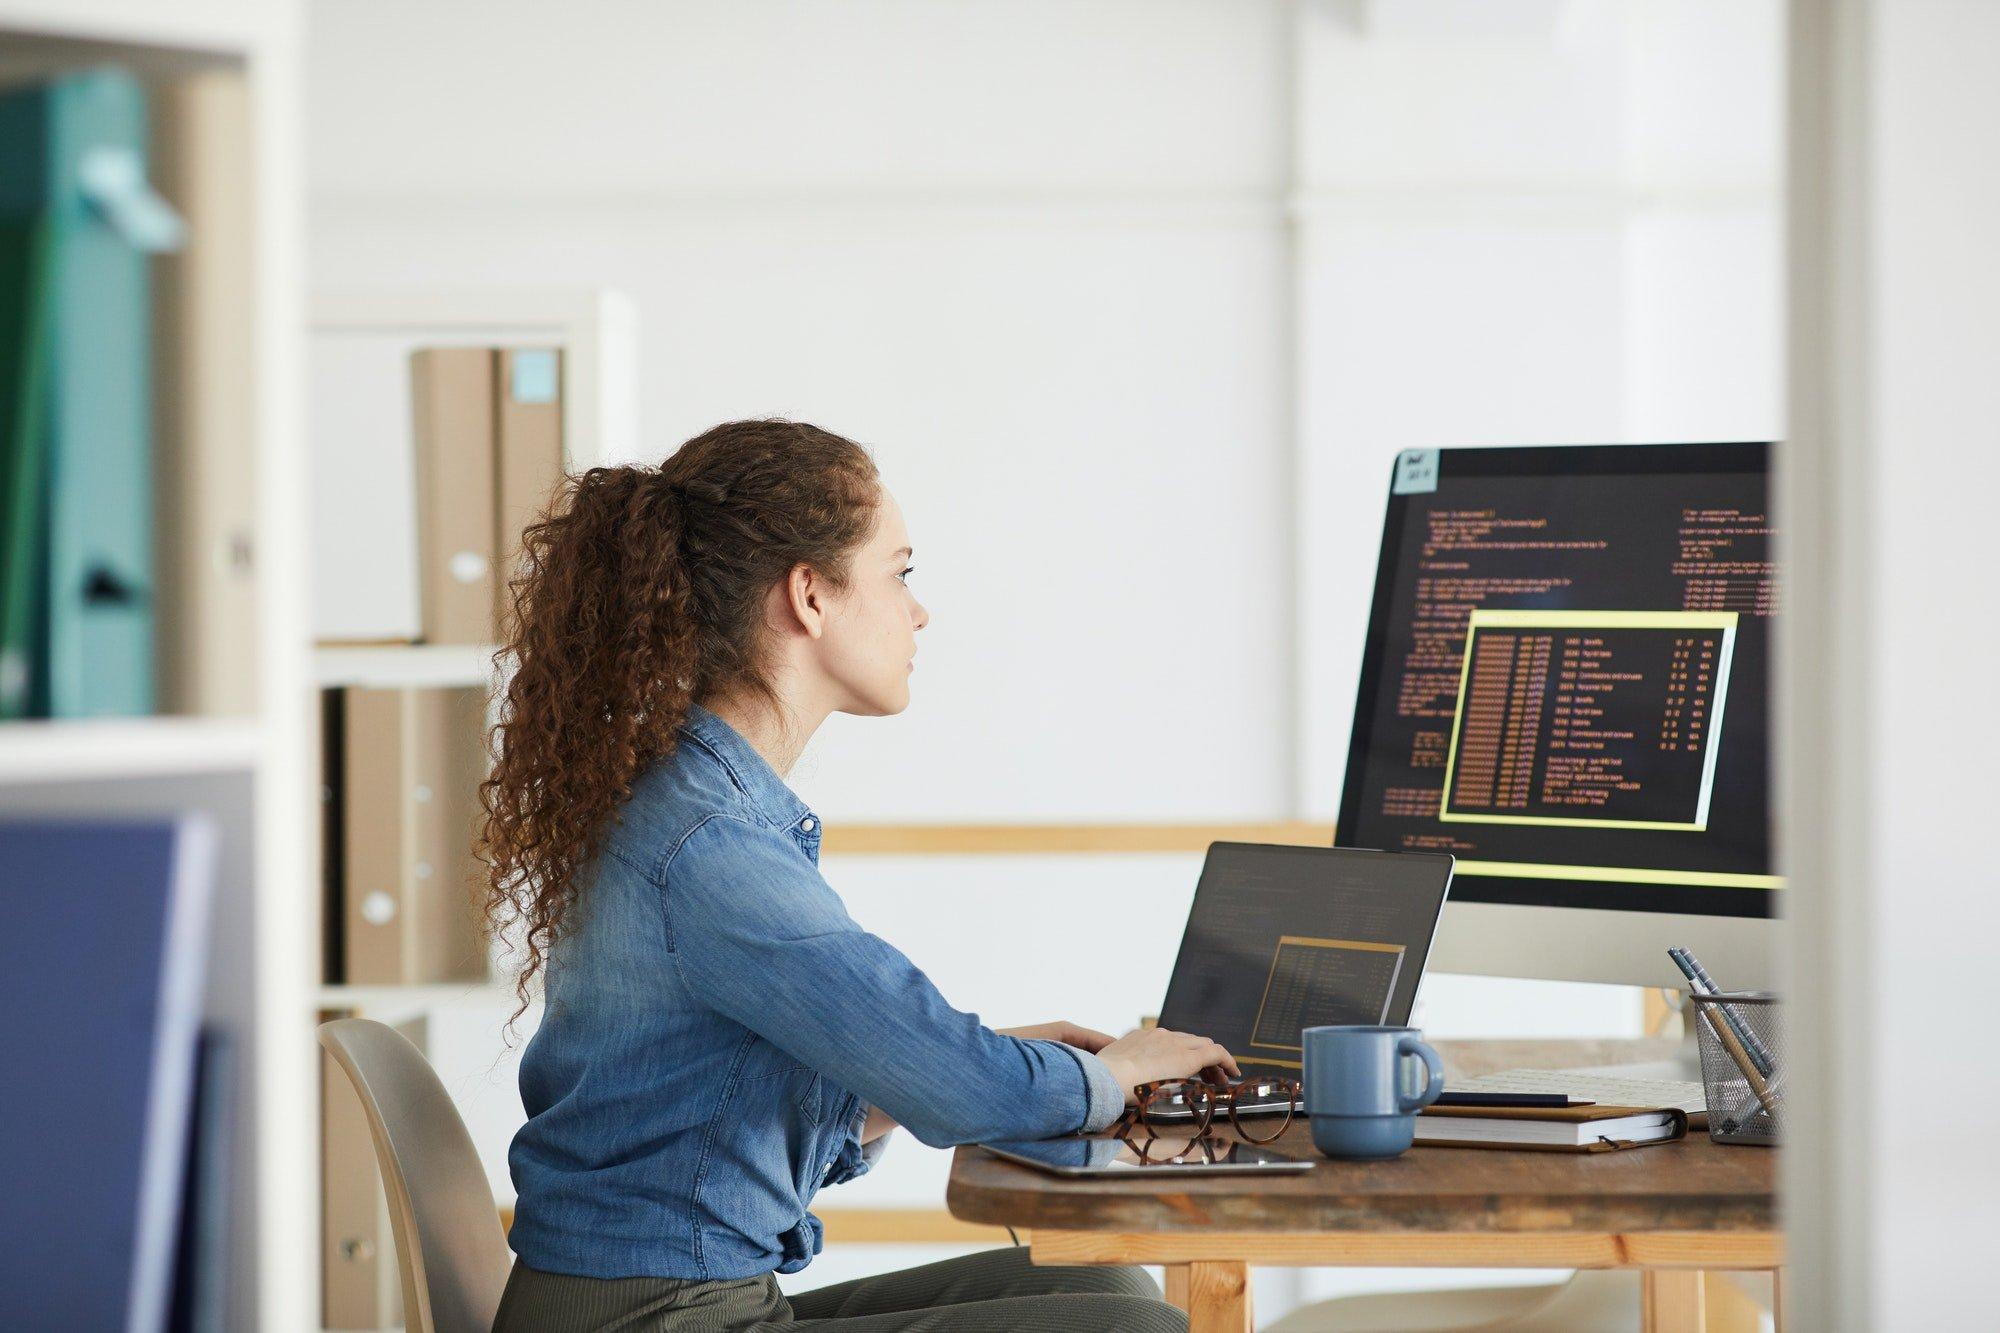 Young Woman Working in Software Development Studio